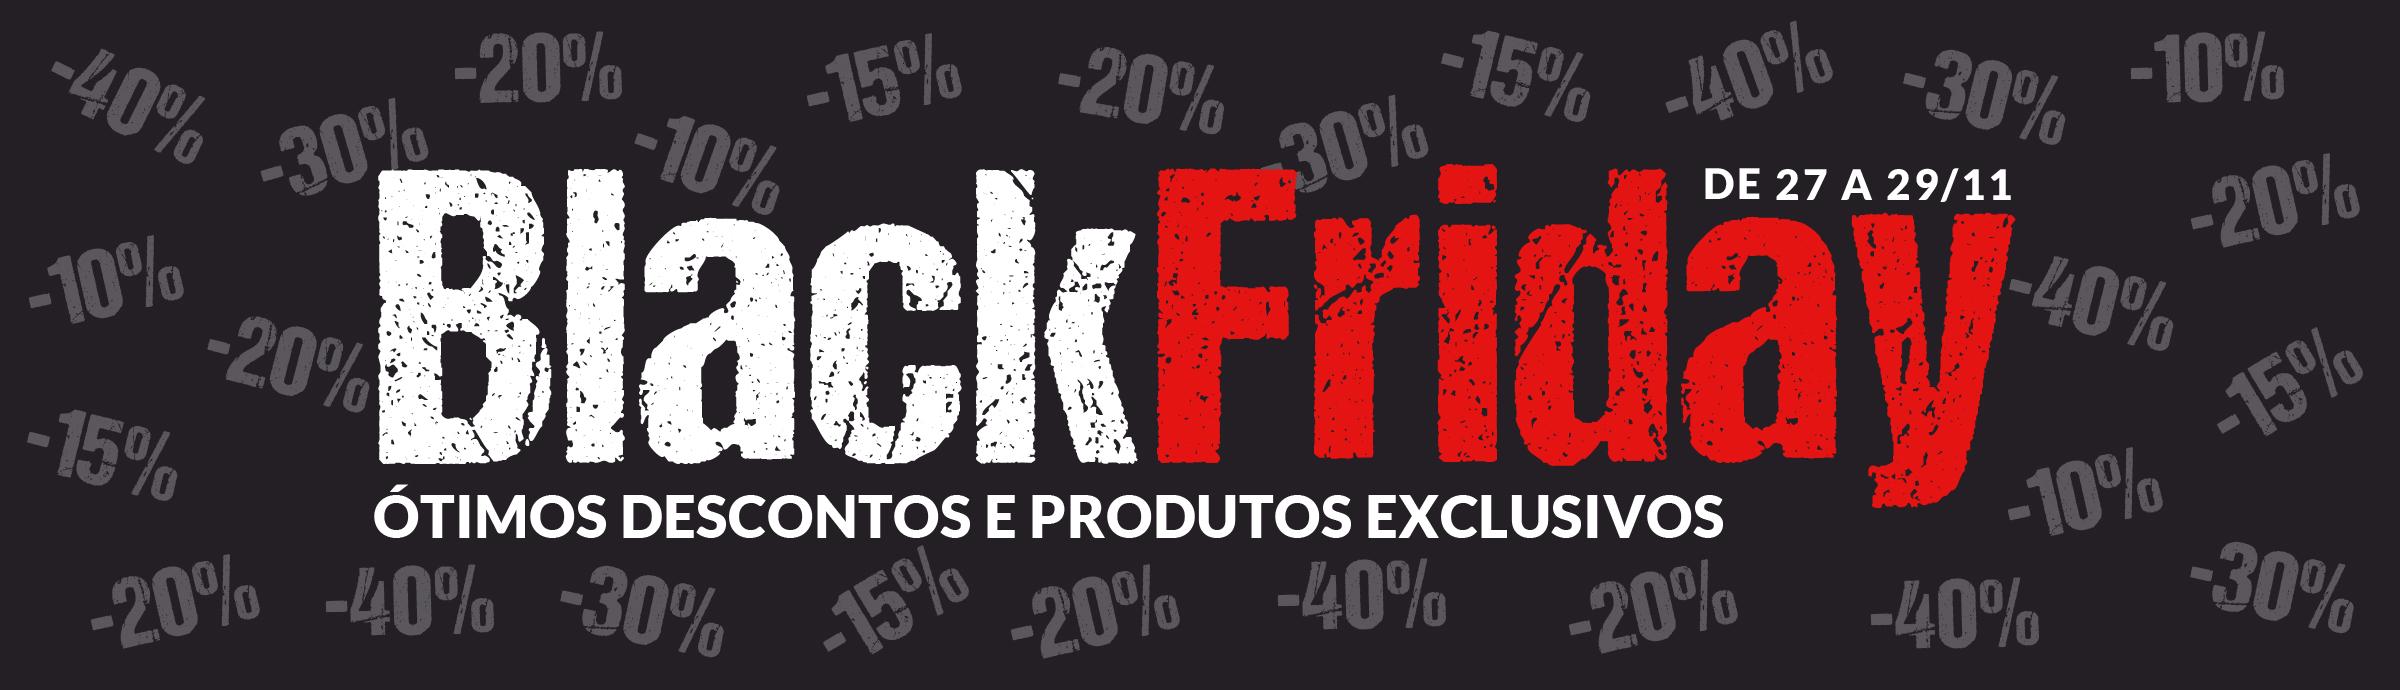 Black Friday Gorjuss 2020